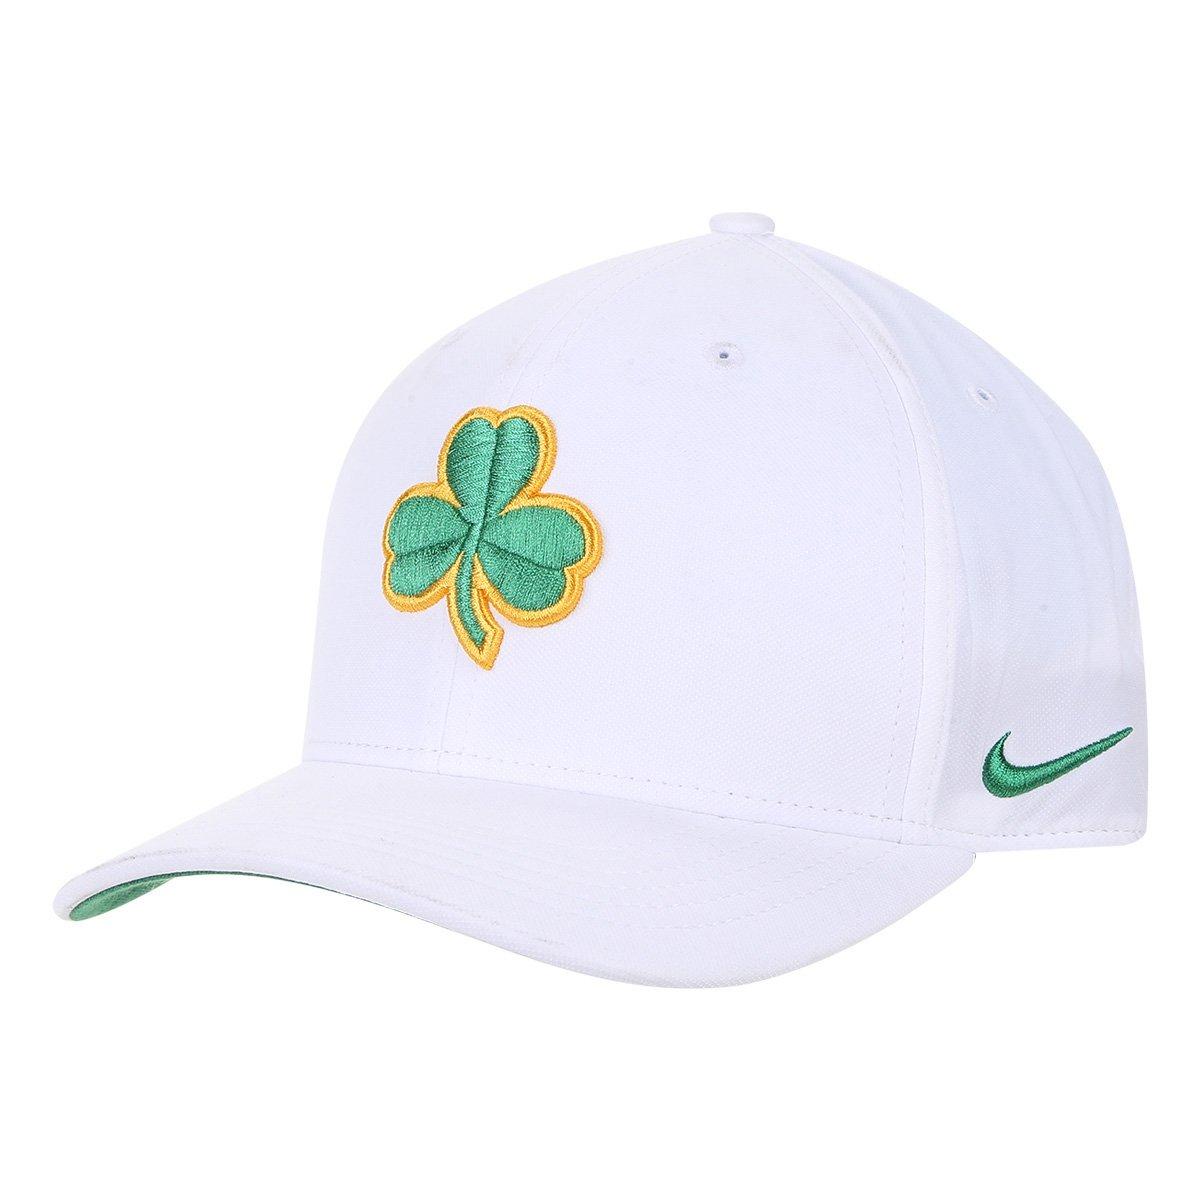 Boné Nike NBA Boston Celtics Aba Curva City Edition Dry - Compre Agora  bfd10ed64a8